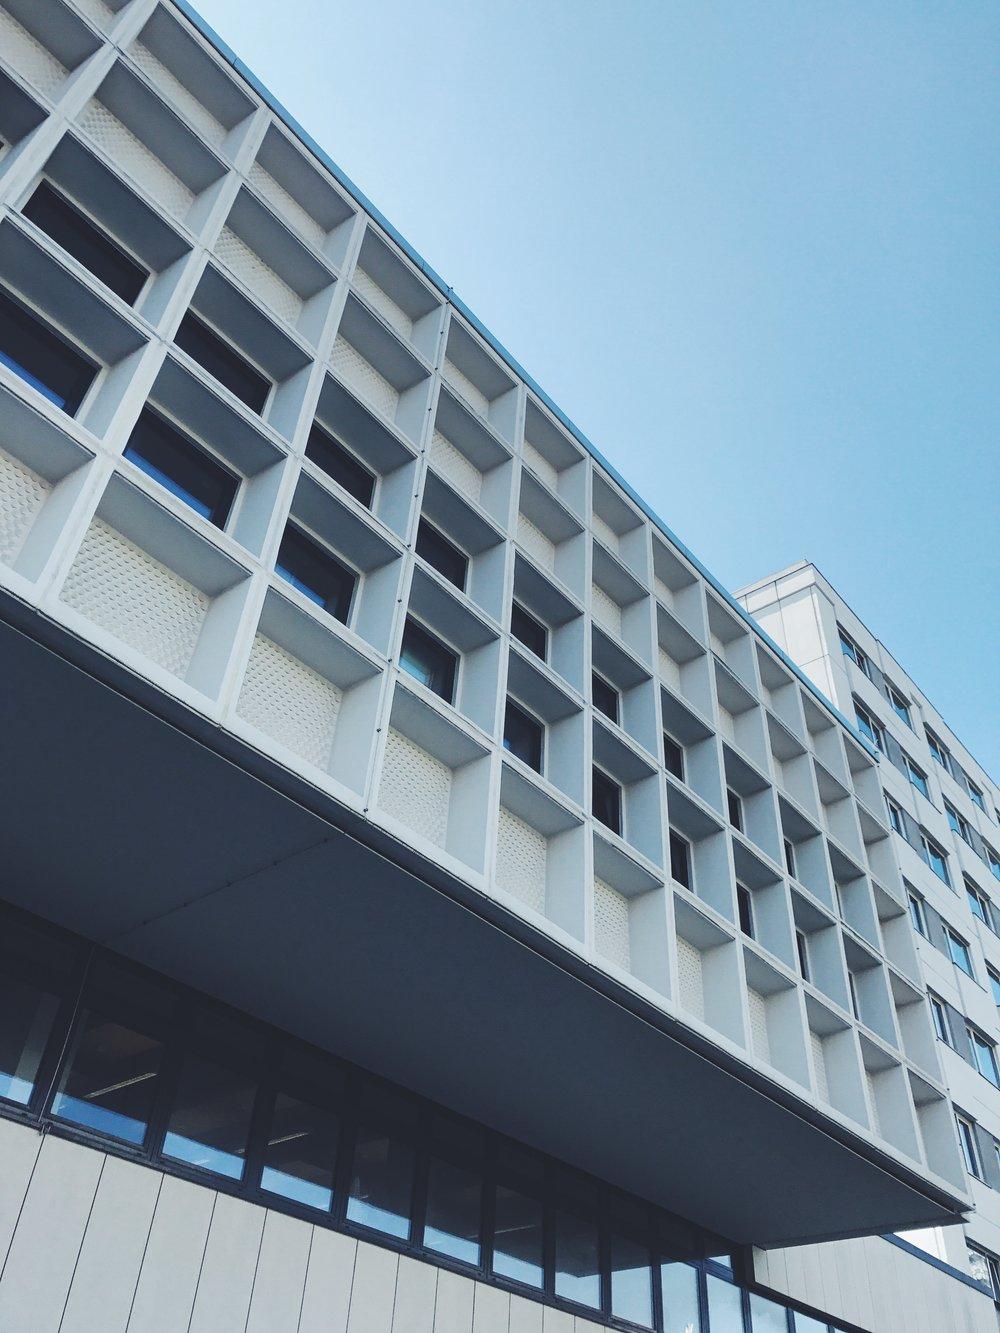 Weaving & Architecture 2 (Emma Wood)